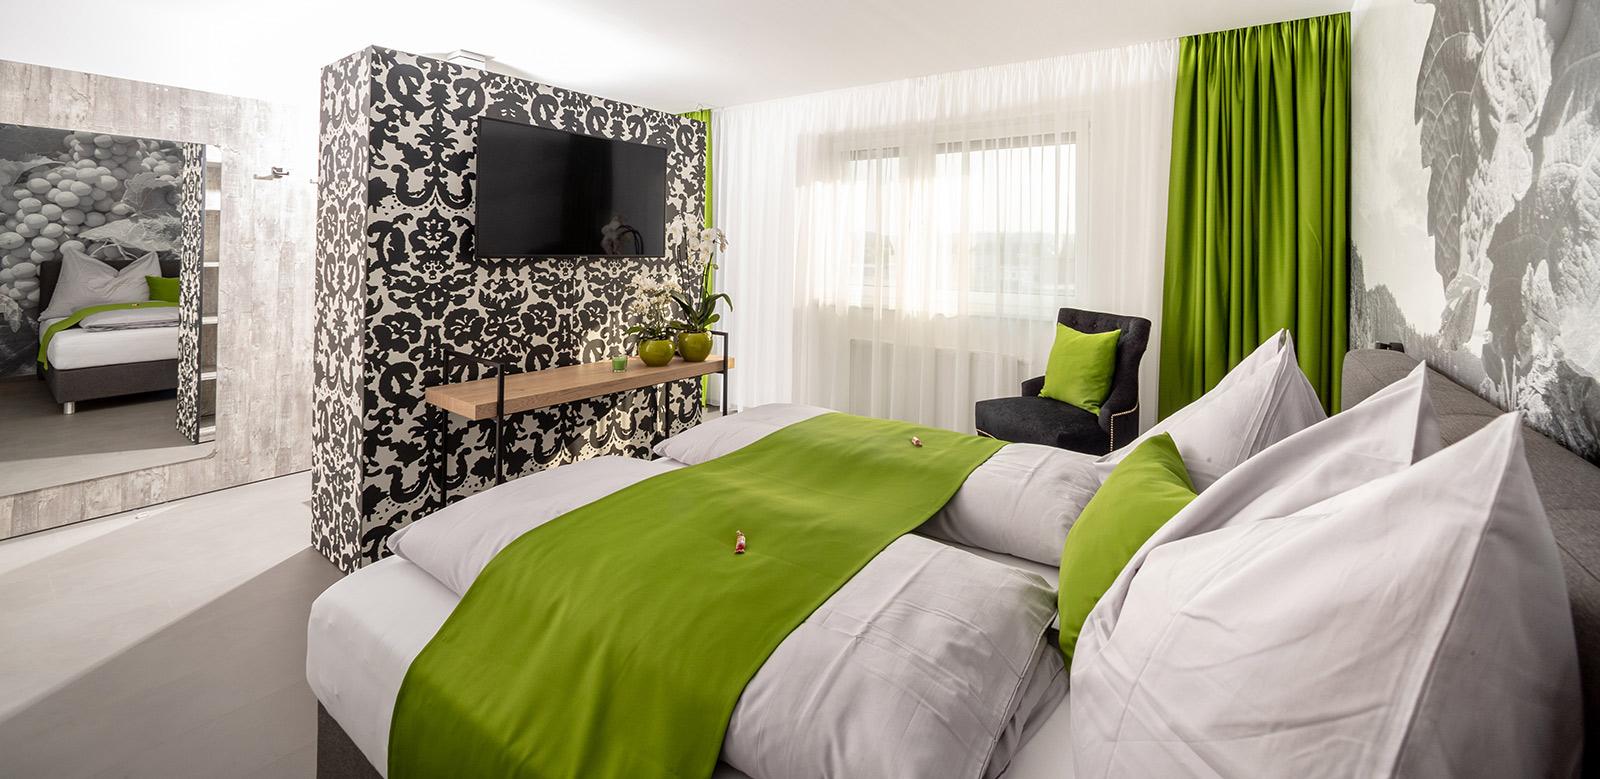 Hotel Greenrooms